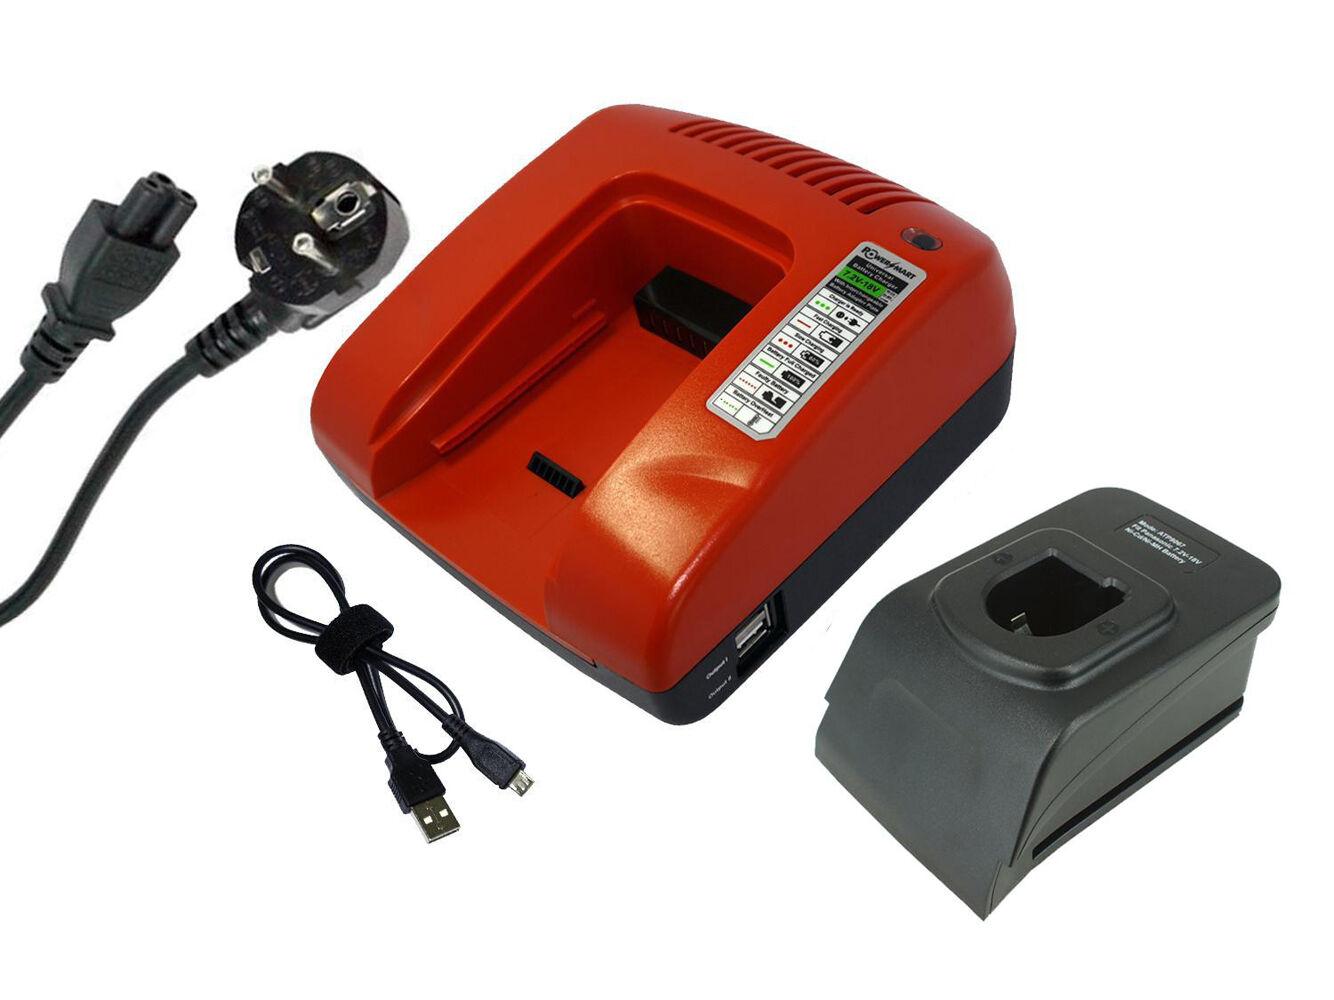 7.2-18V Ladegerät für Panasonic EY6405FQKW EY6406FQKW EY6407NQKW EY6409NQKW, Rot